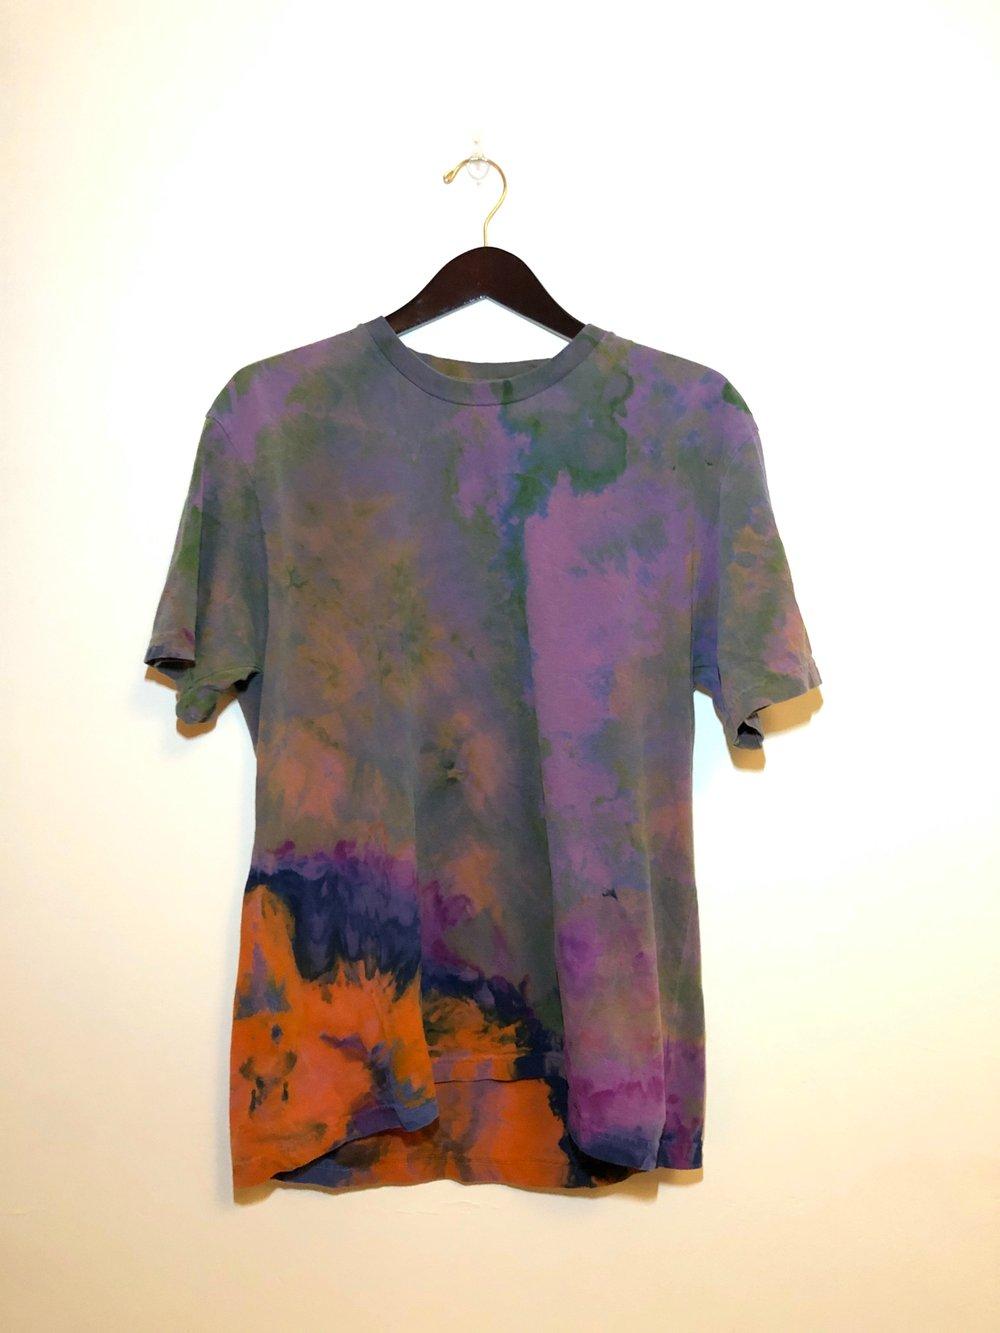 Shirt #18 - Medium